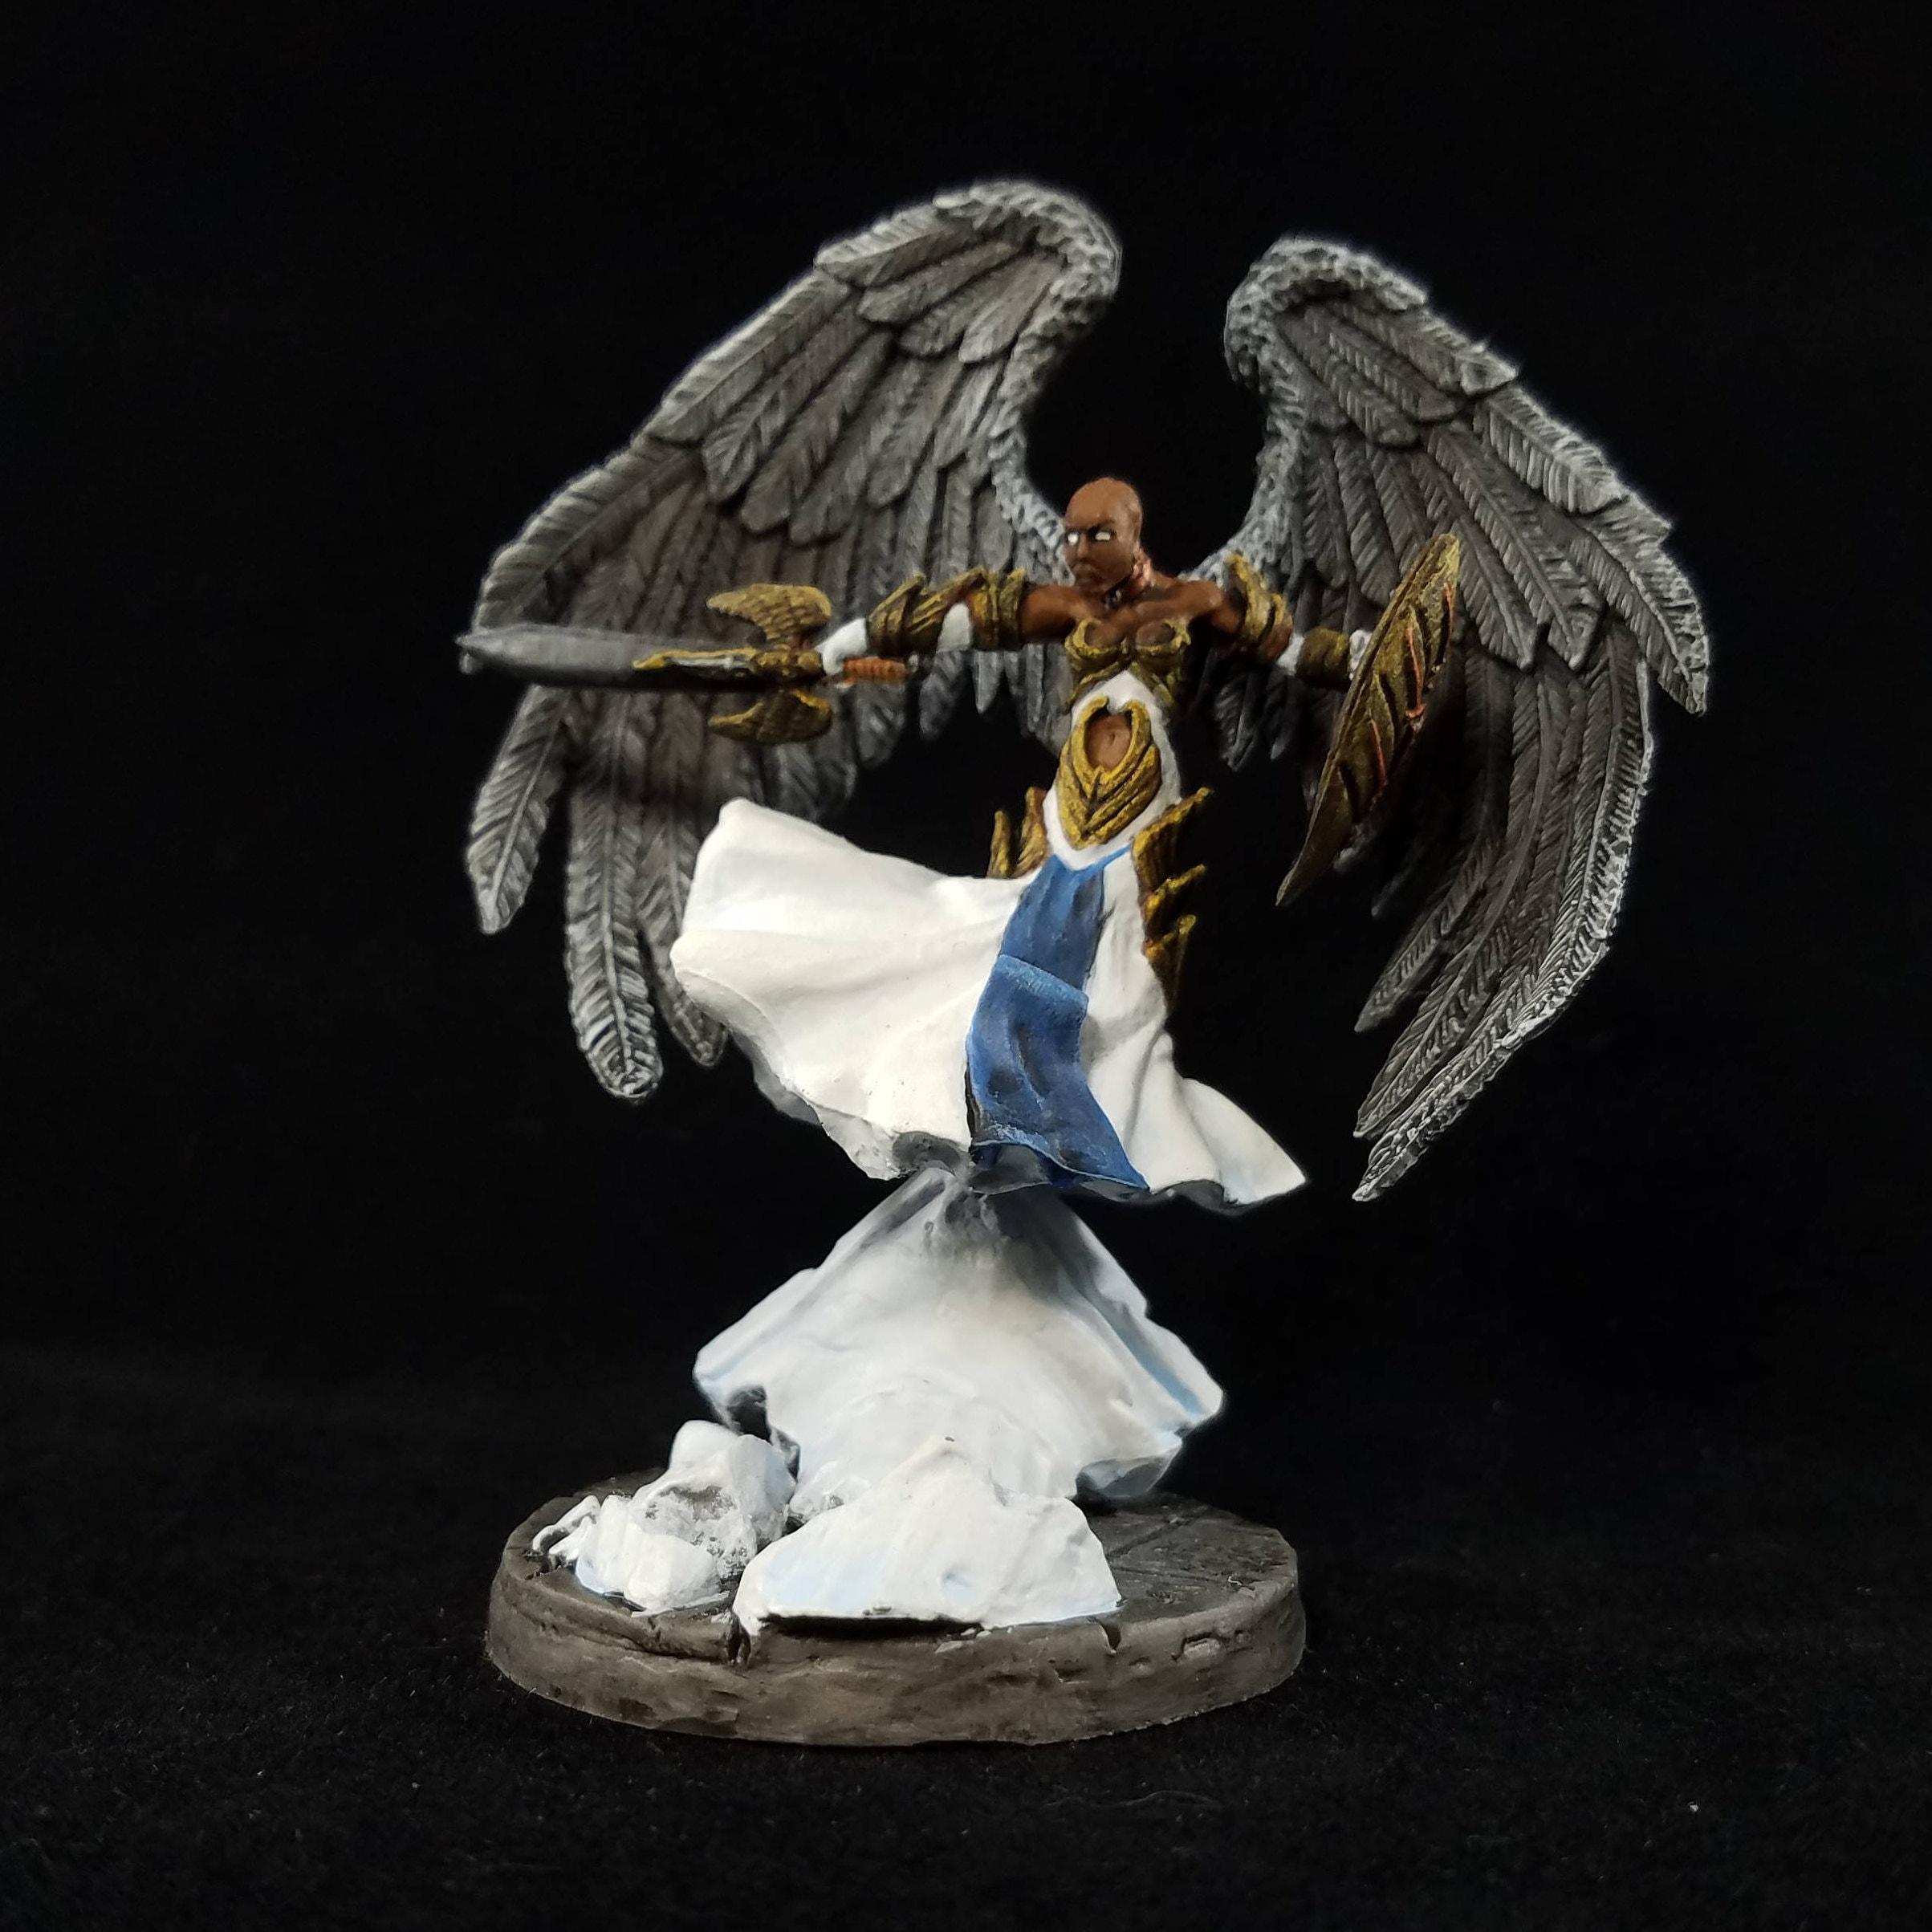 Female Aasimar Fighter Painted Mini (Reaper 77363) Air Genasi Barbarian  Cleric Paladin Ranger Cavalier D&D Pathfinder Angel Warrior